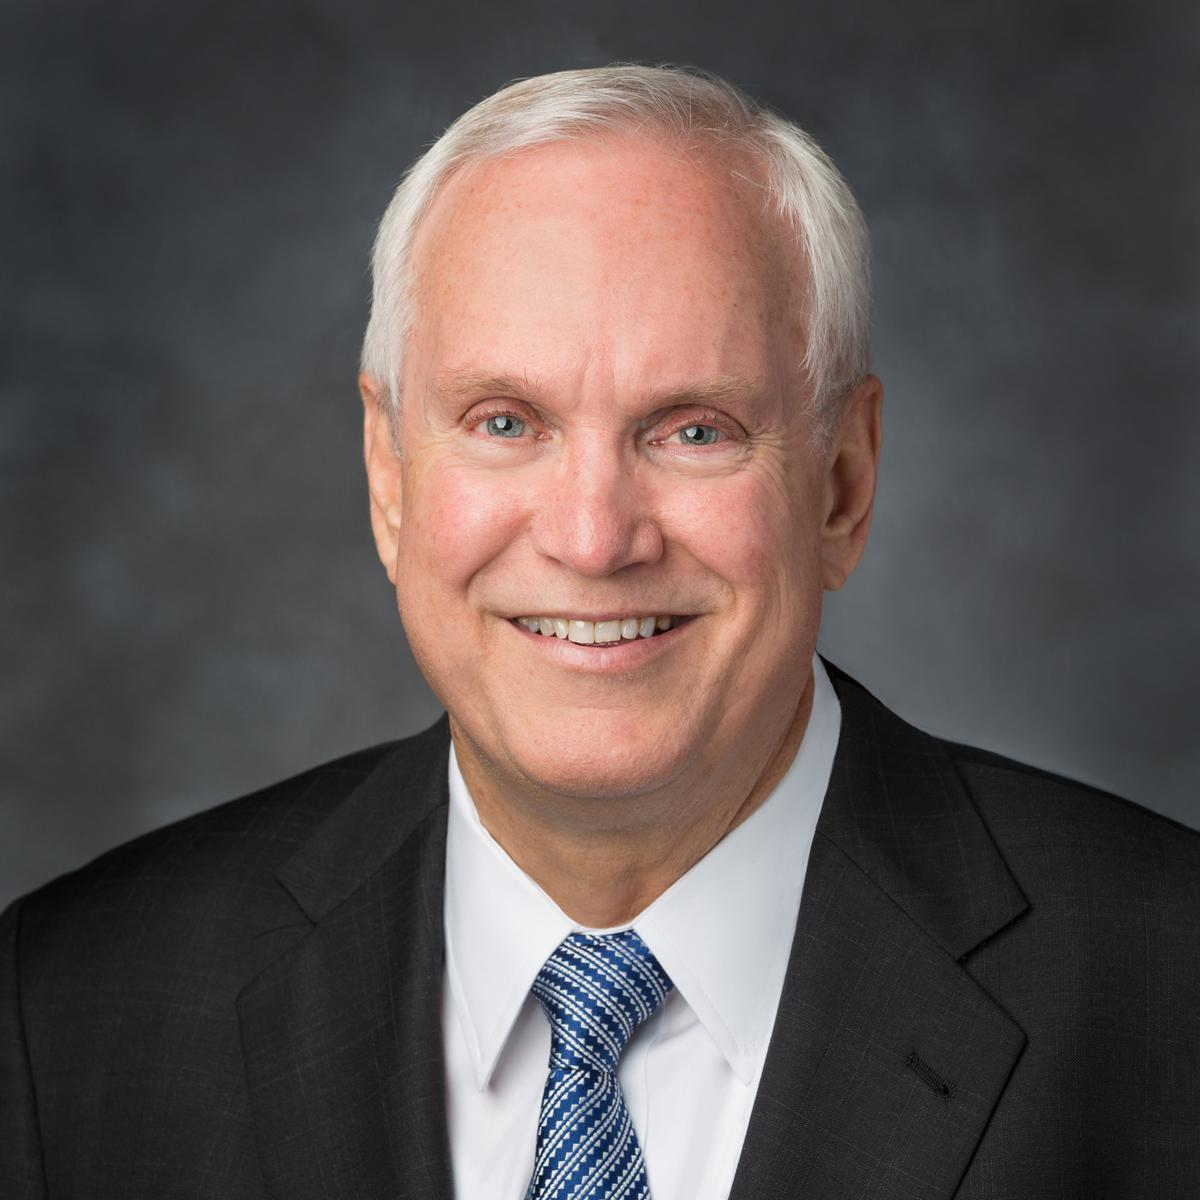 Robert C. Gay